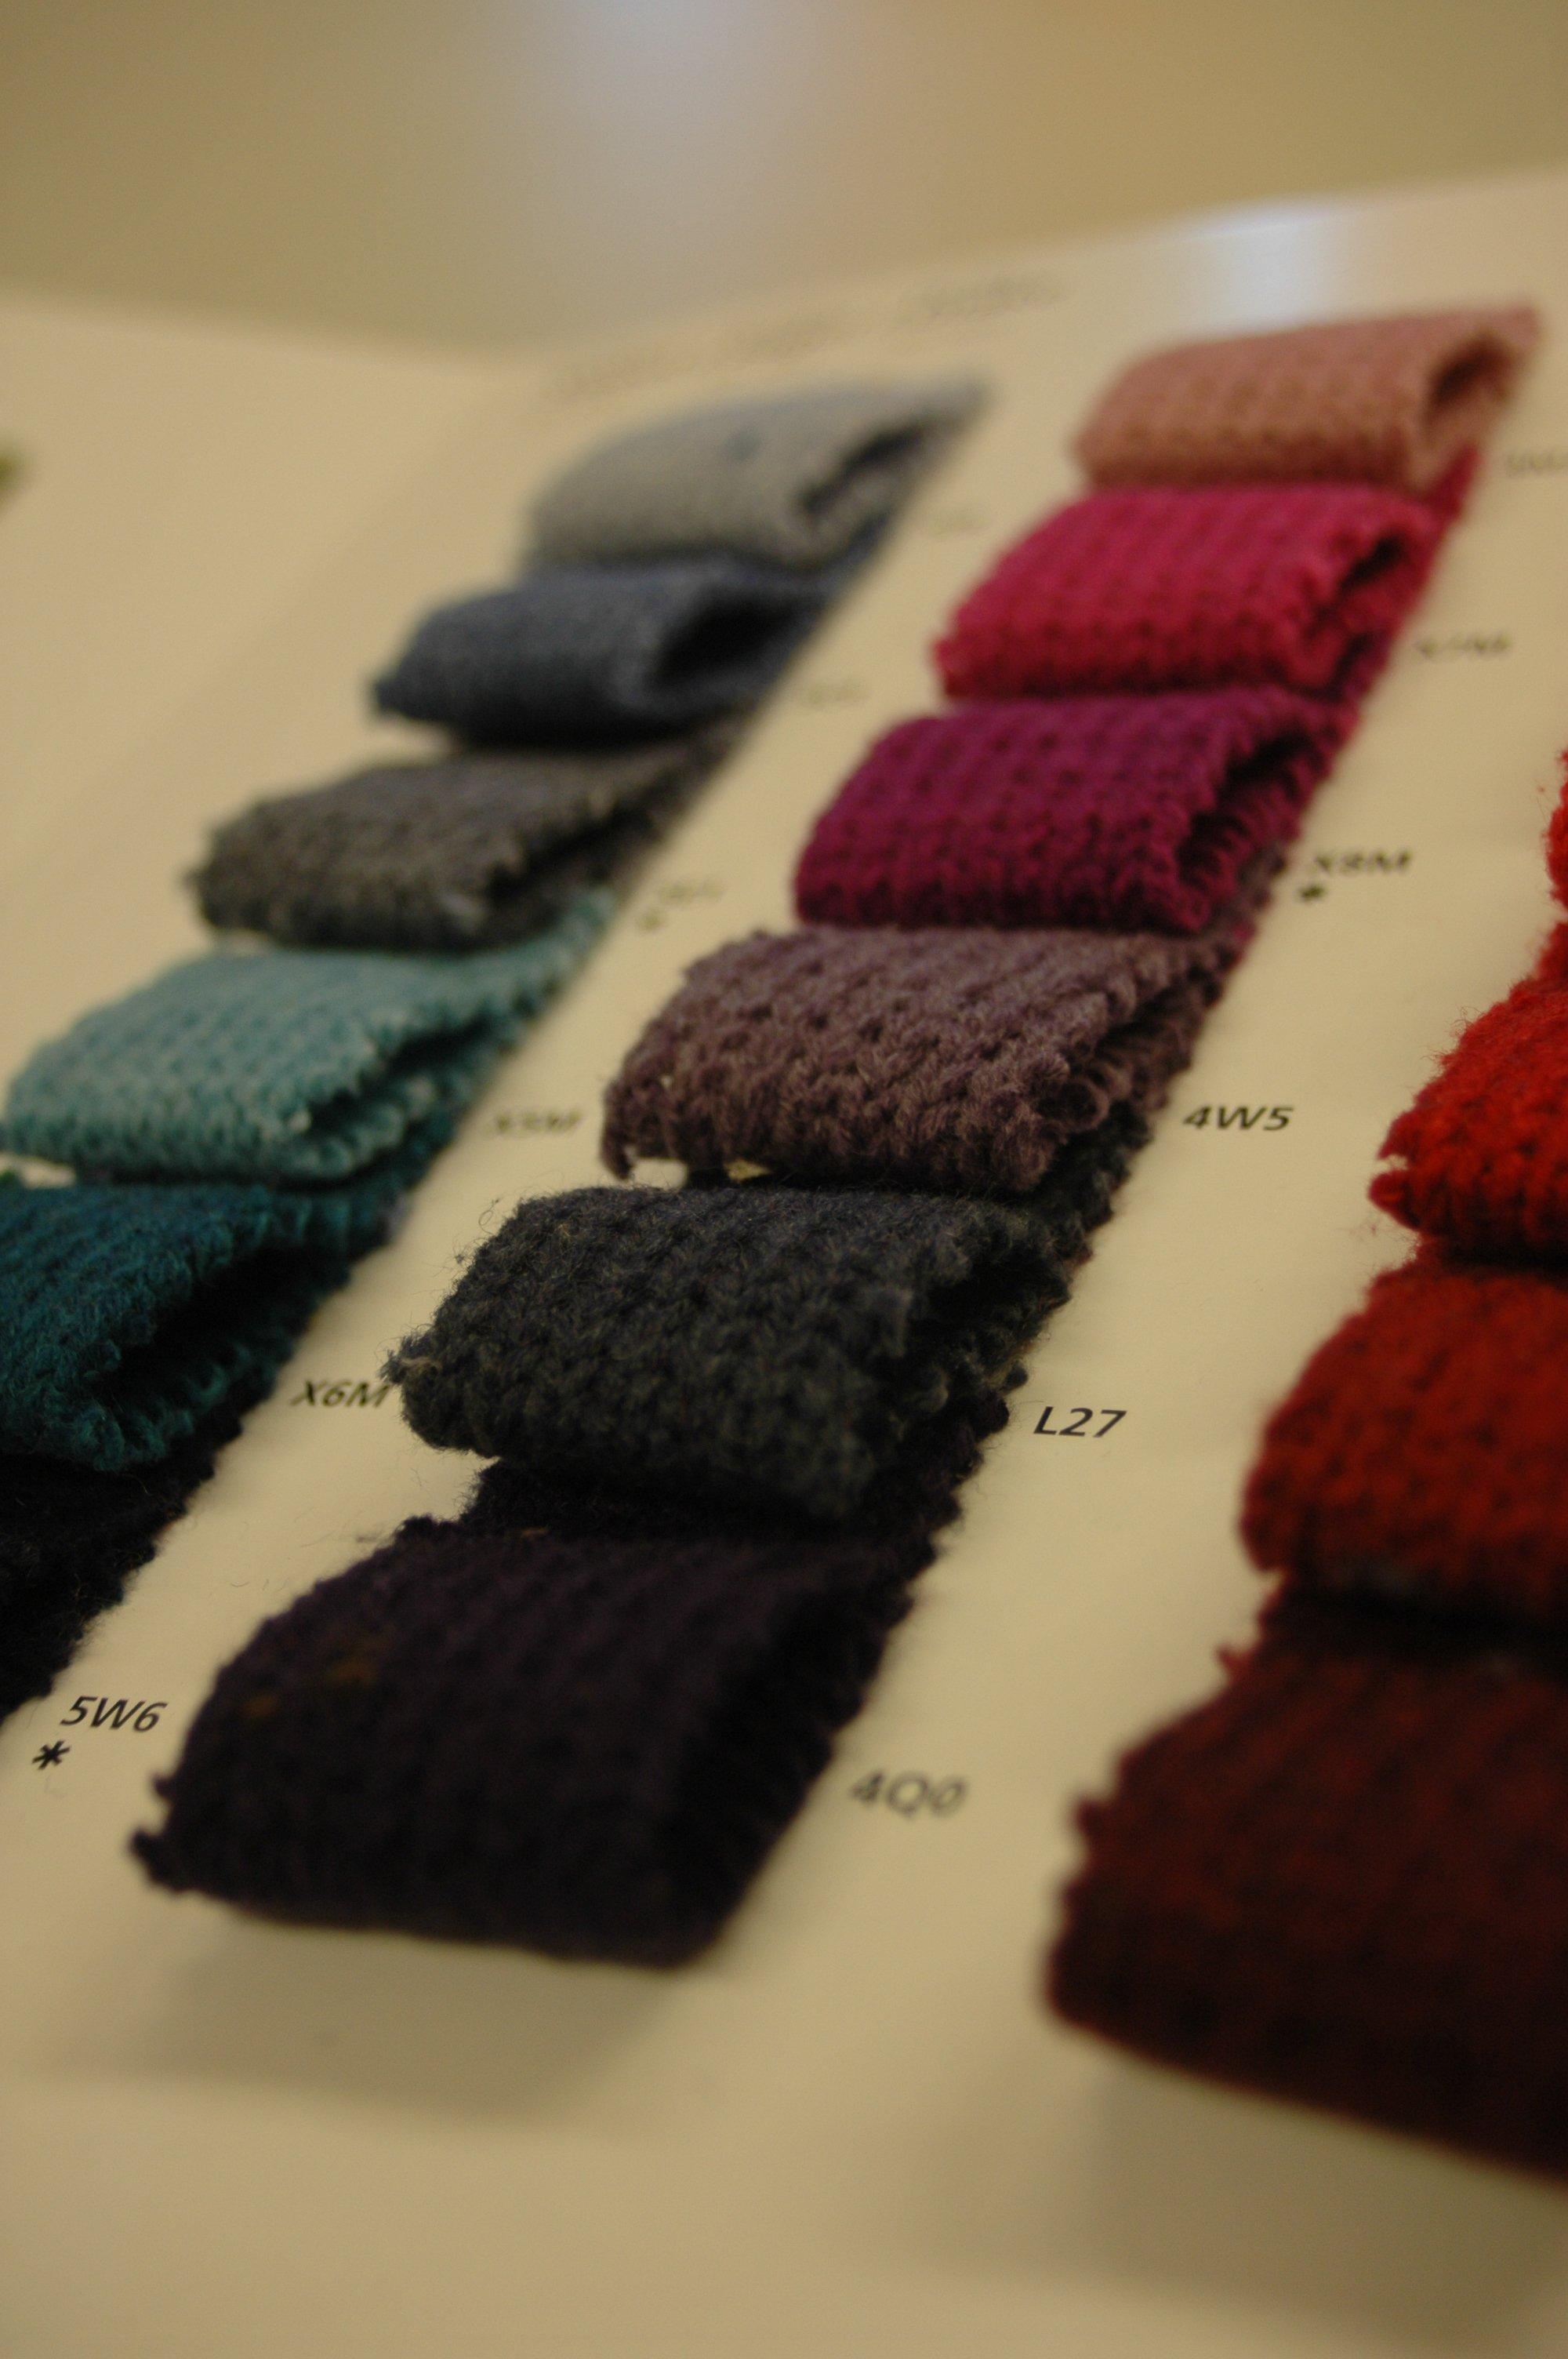 Fabric mill colourcard